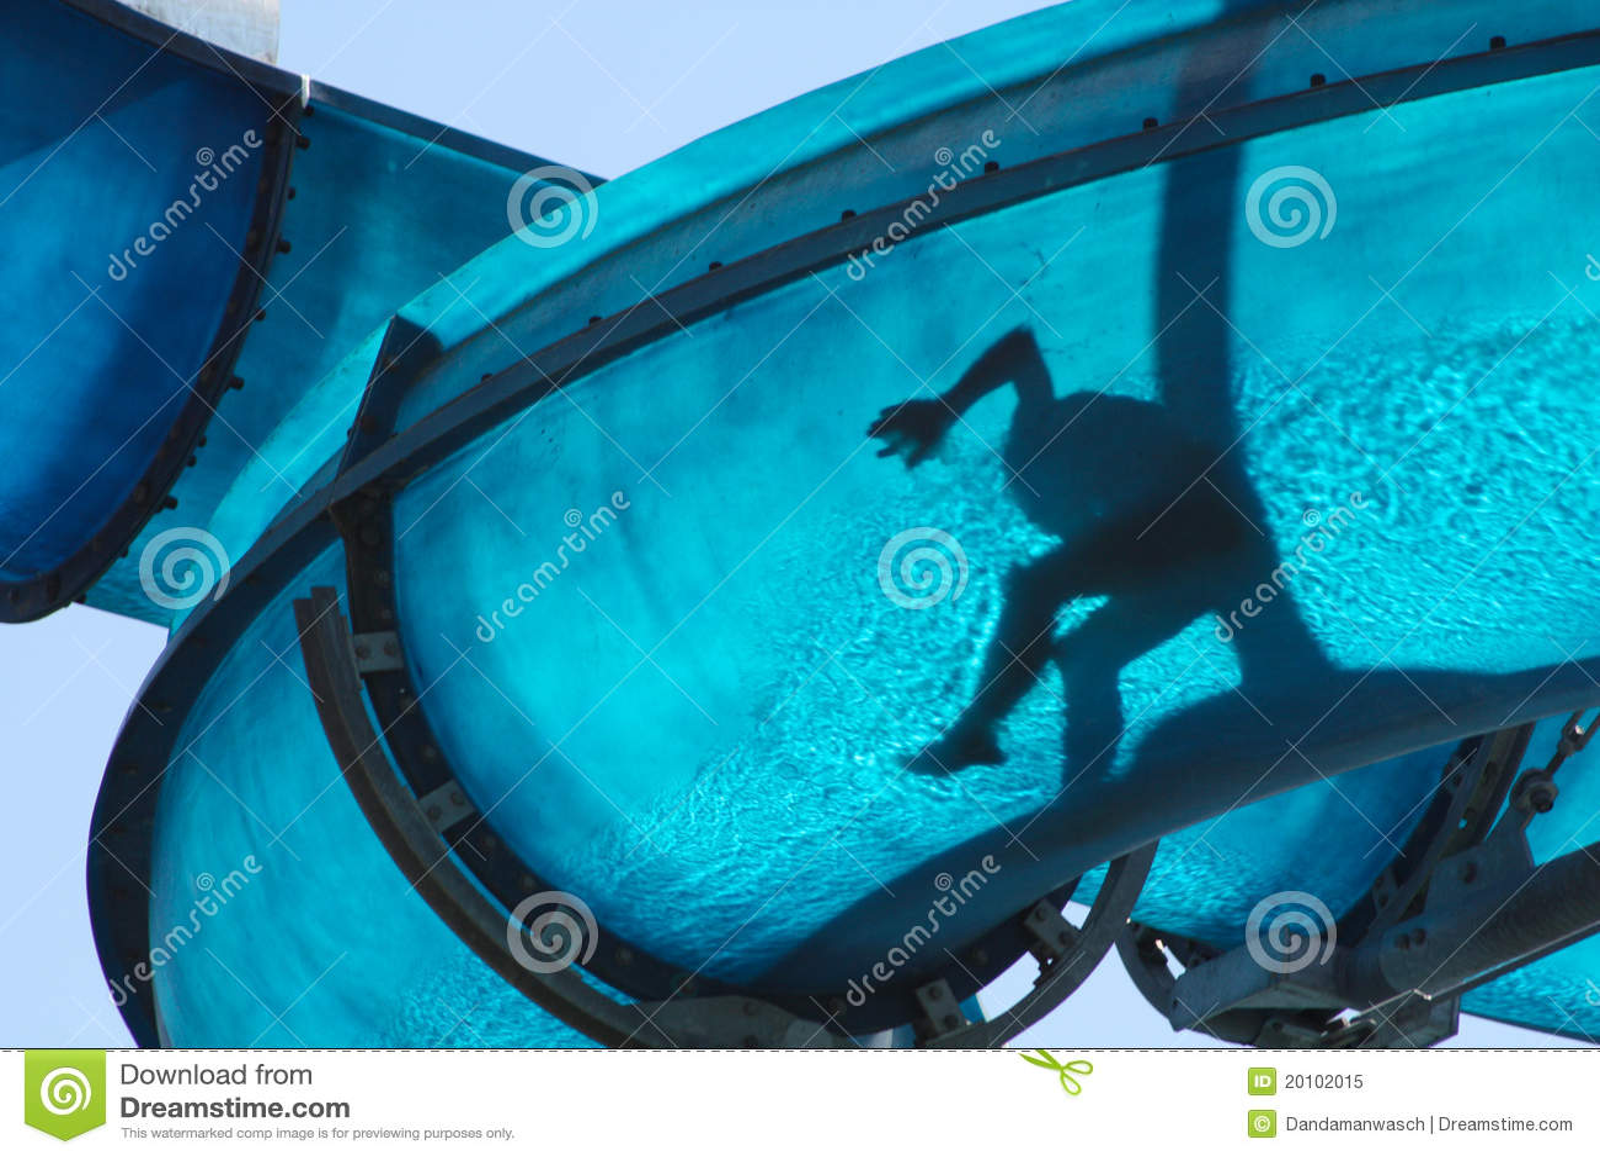 Miúdo que desliza um Waterslide azul